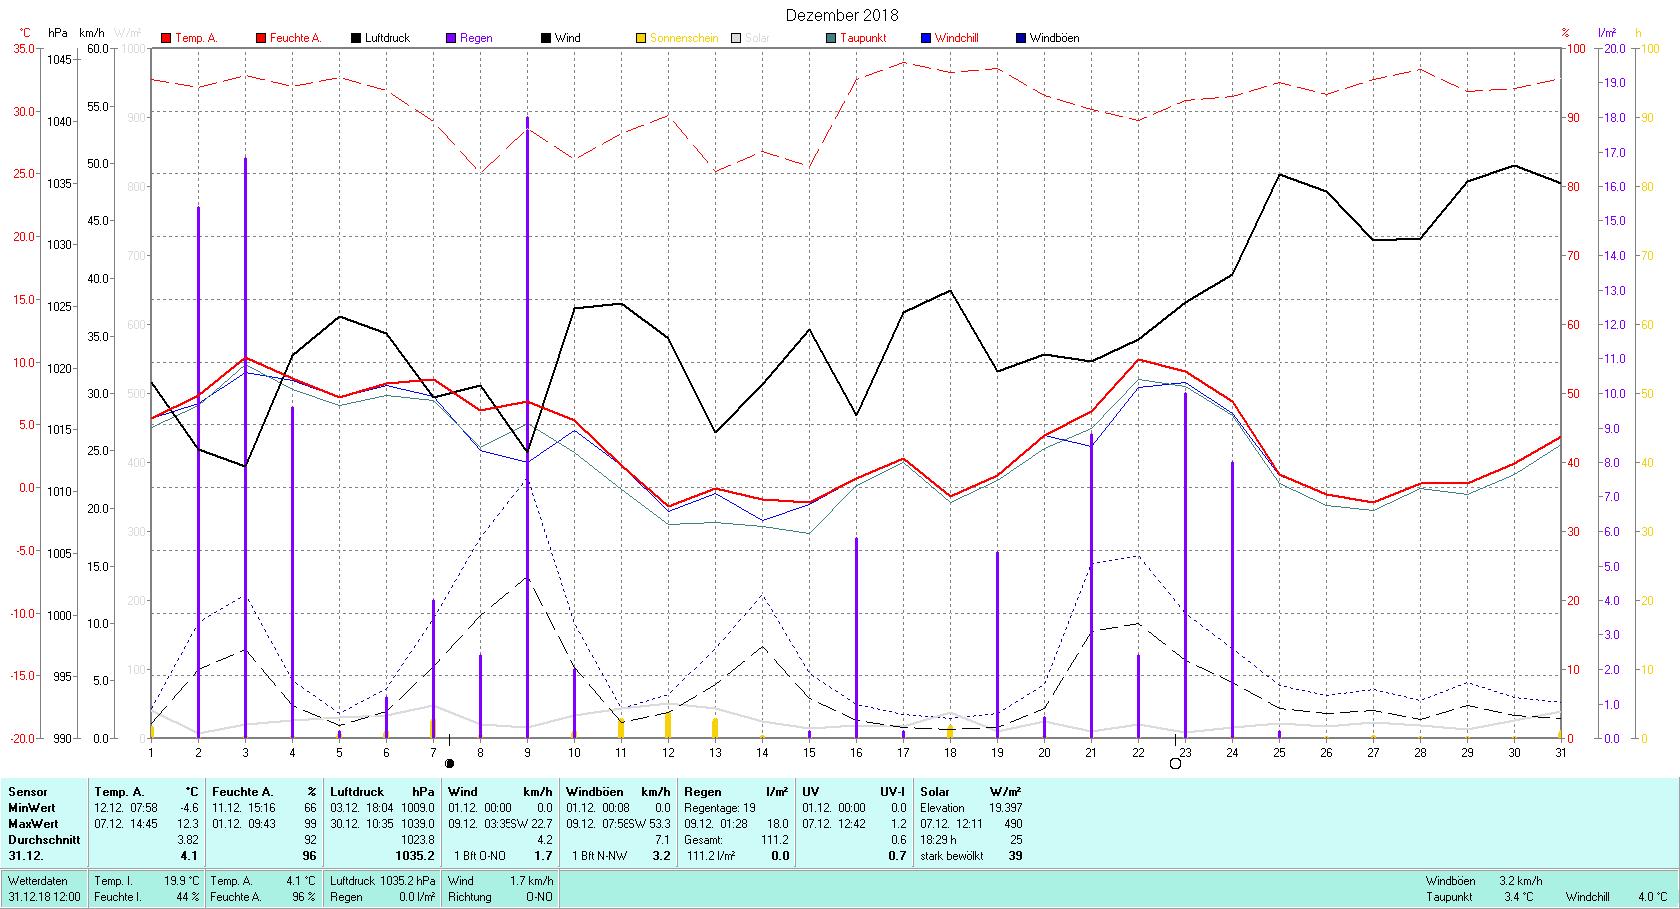 Dezember 2018 Tmin -4.6°C, Tmax 12.3°C, Sonne 18:29 h, Niederschlag 111.2mm/2